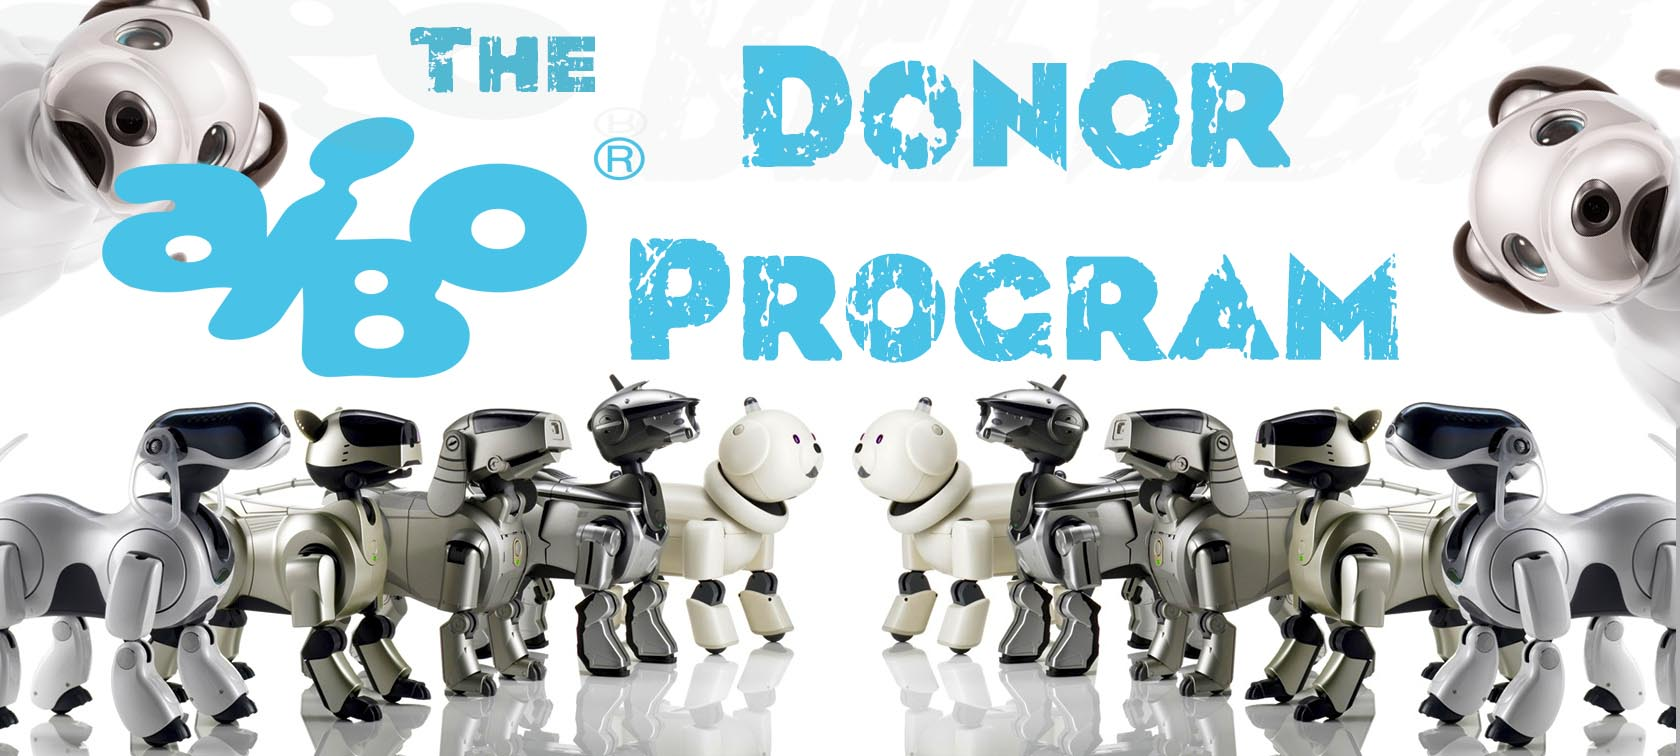 aibo-donor-program-main-banner